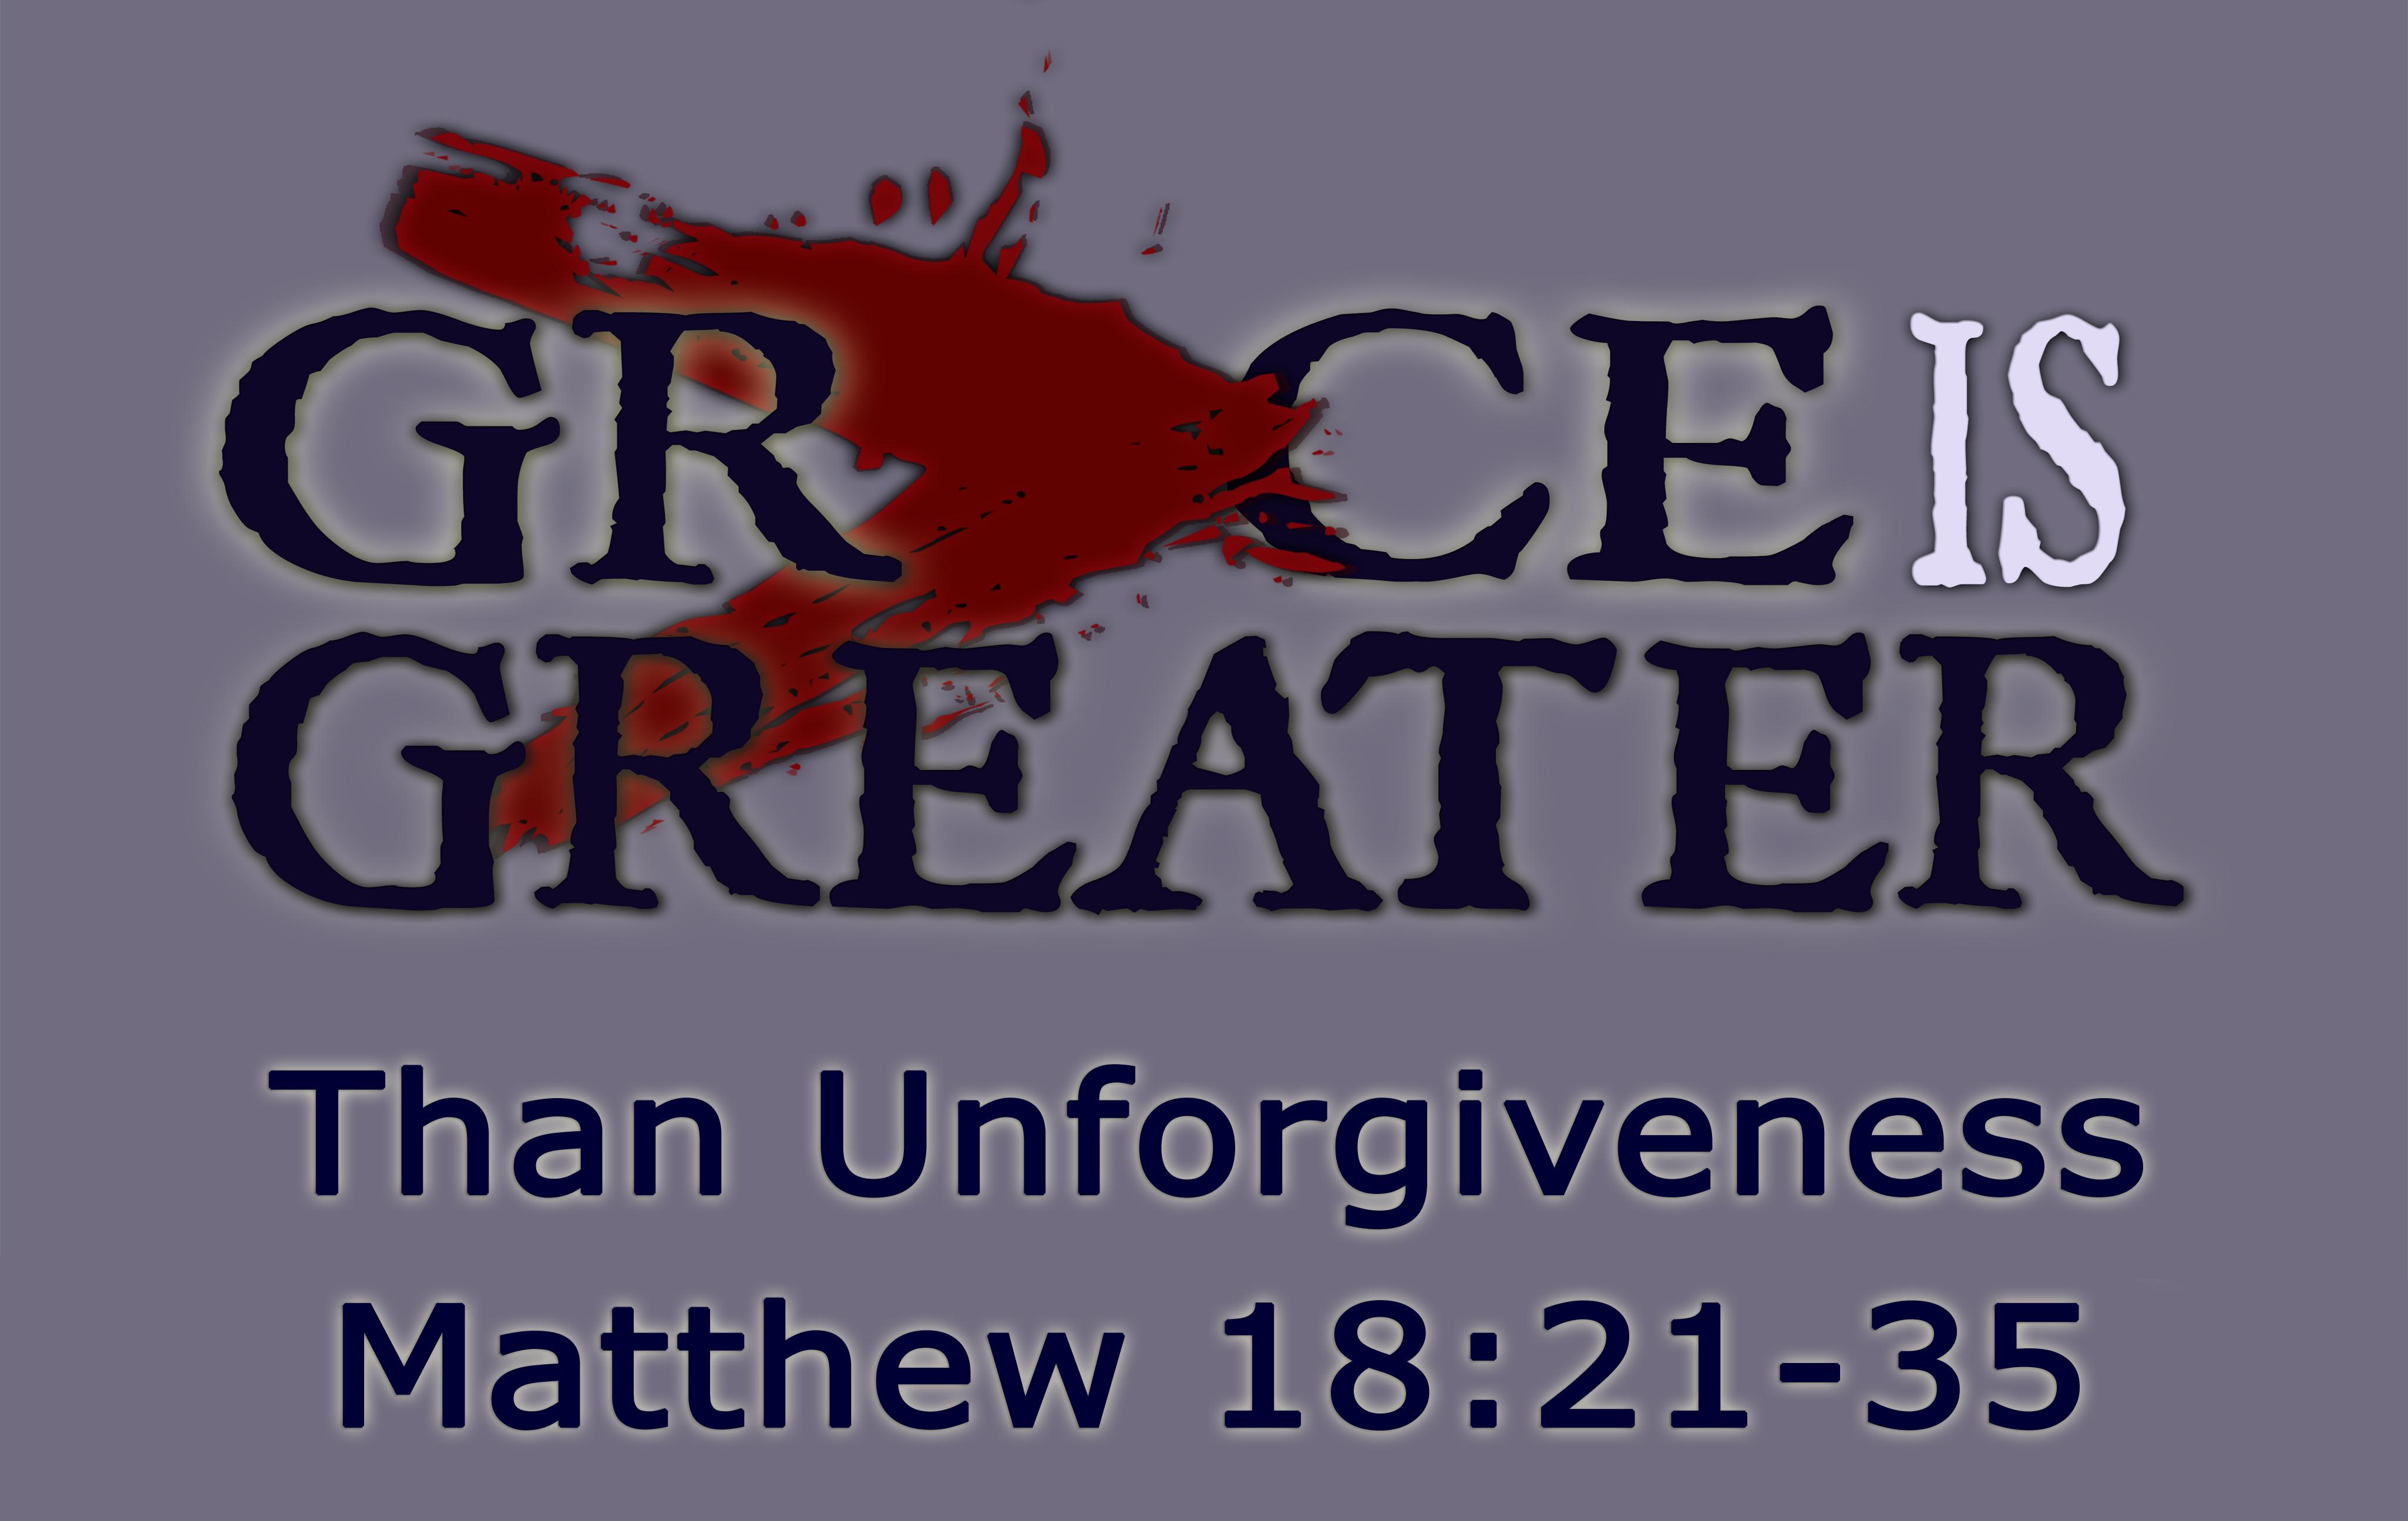 Than Unforgiveness